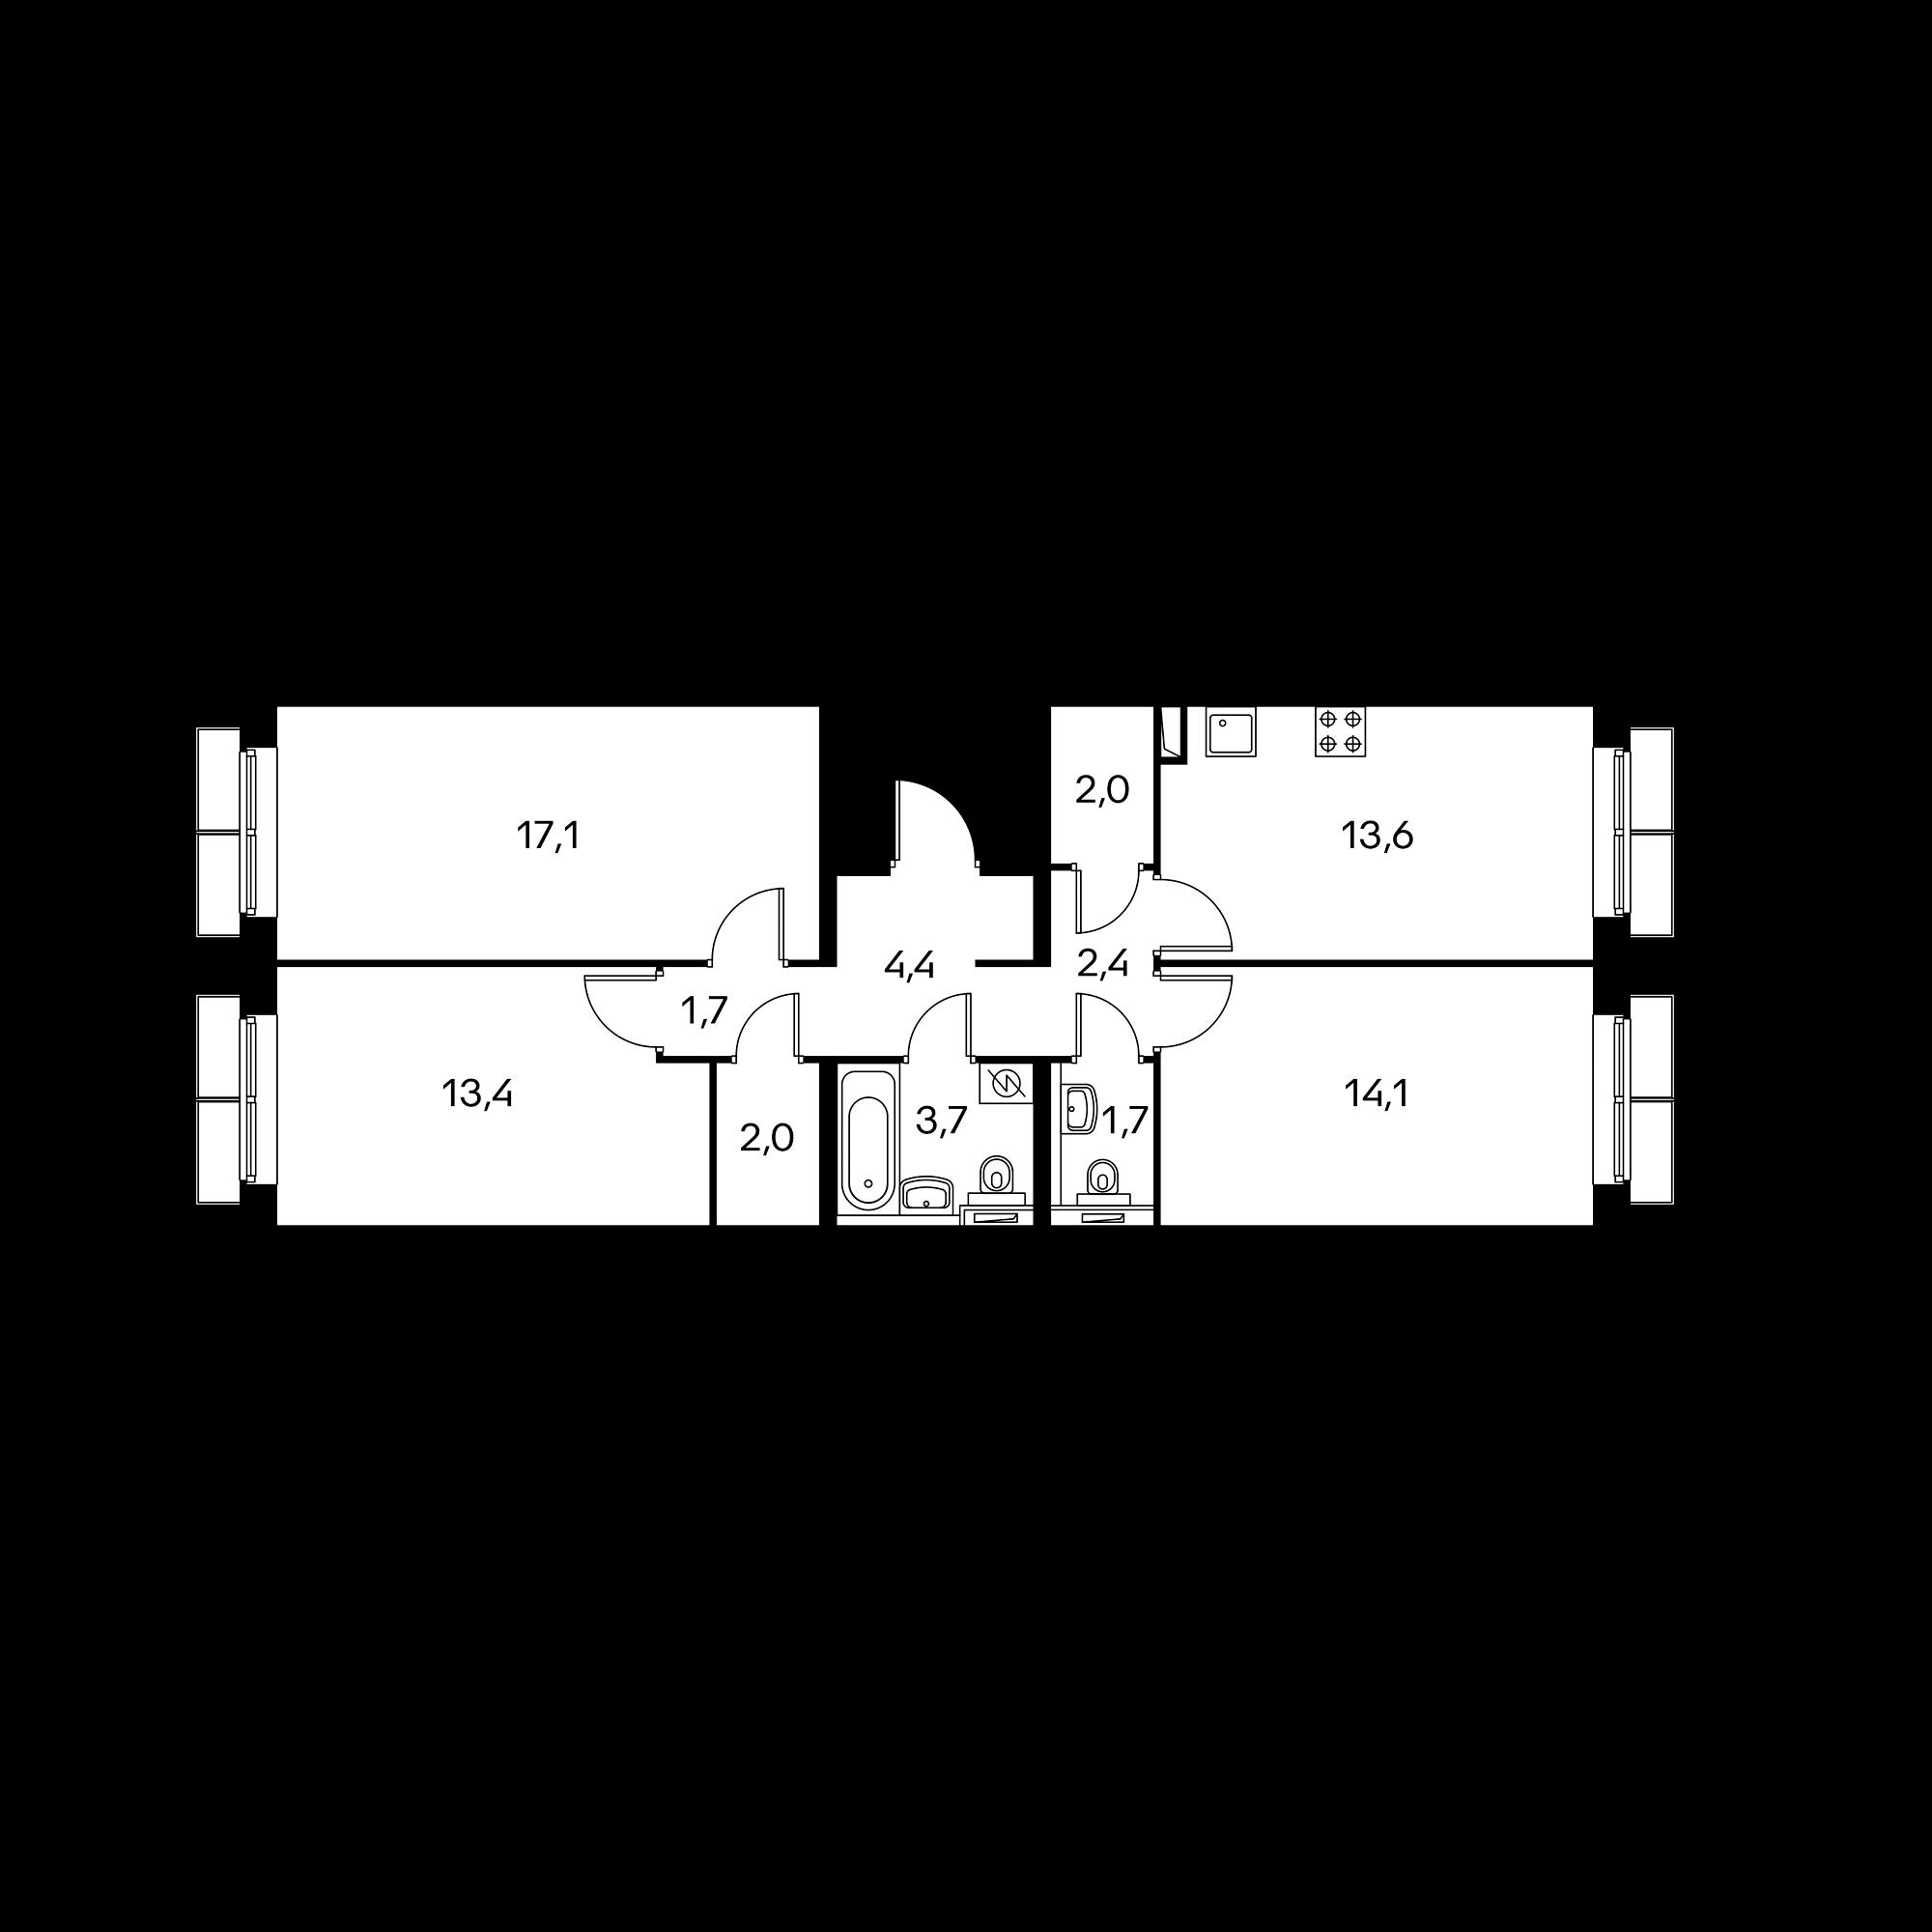 3KM15_6.0-1_S_Z